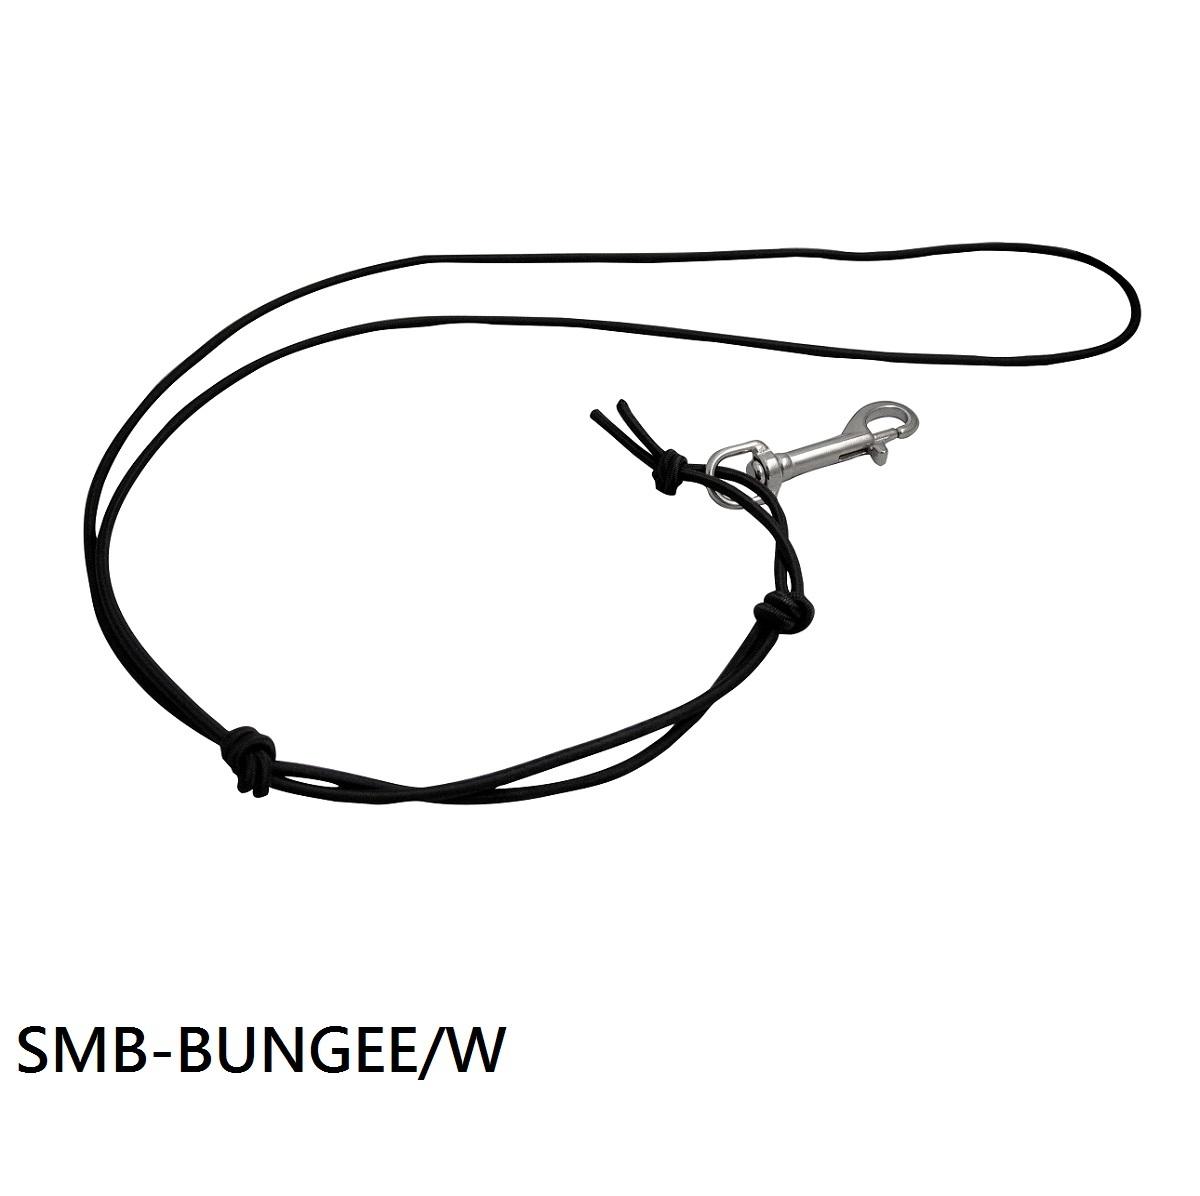 SMB BUNGEE_W.jpg